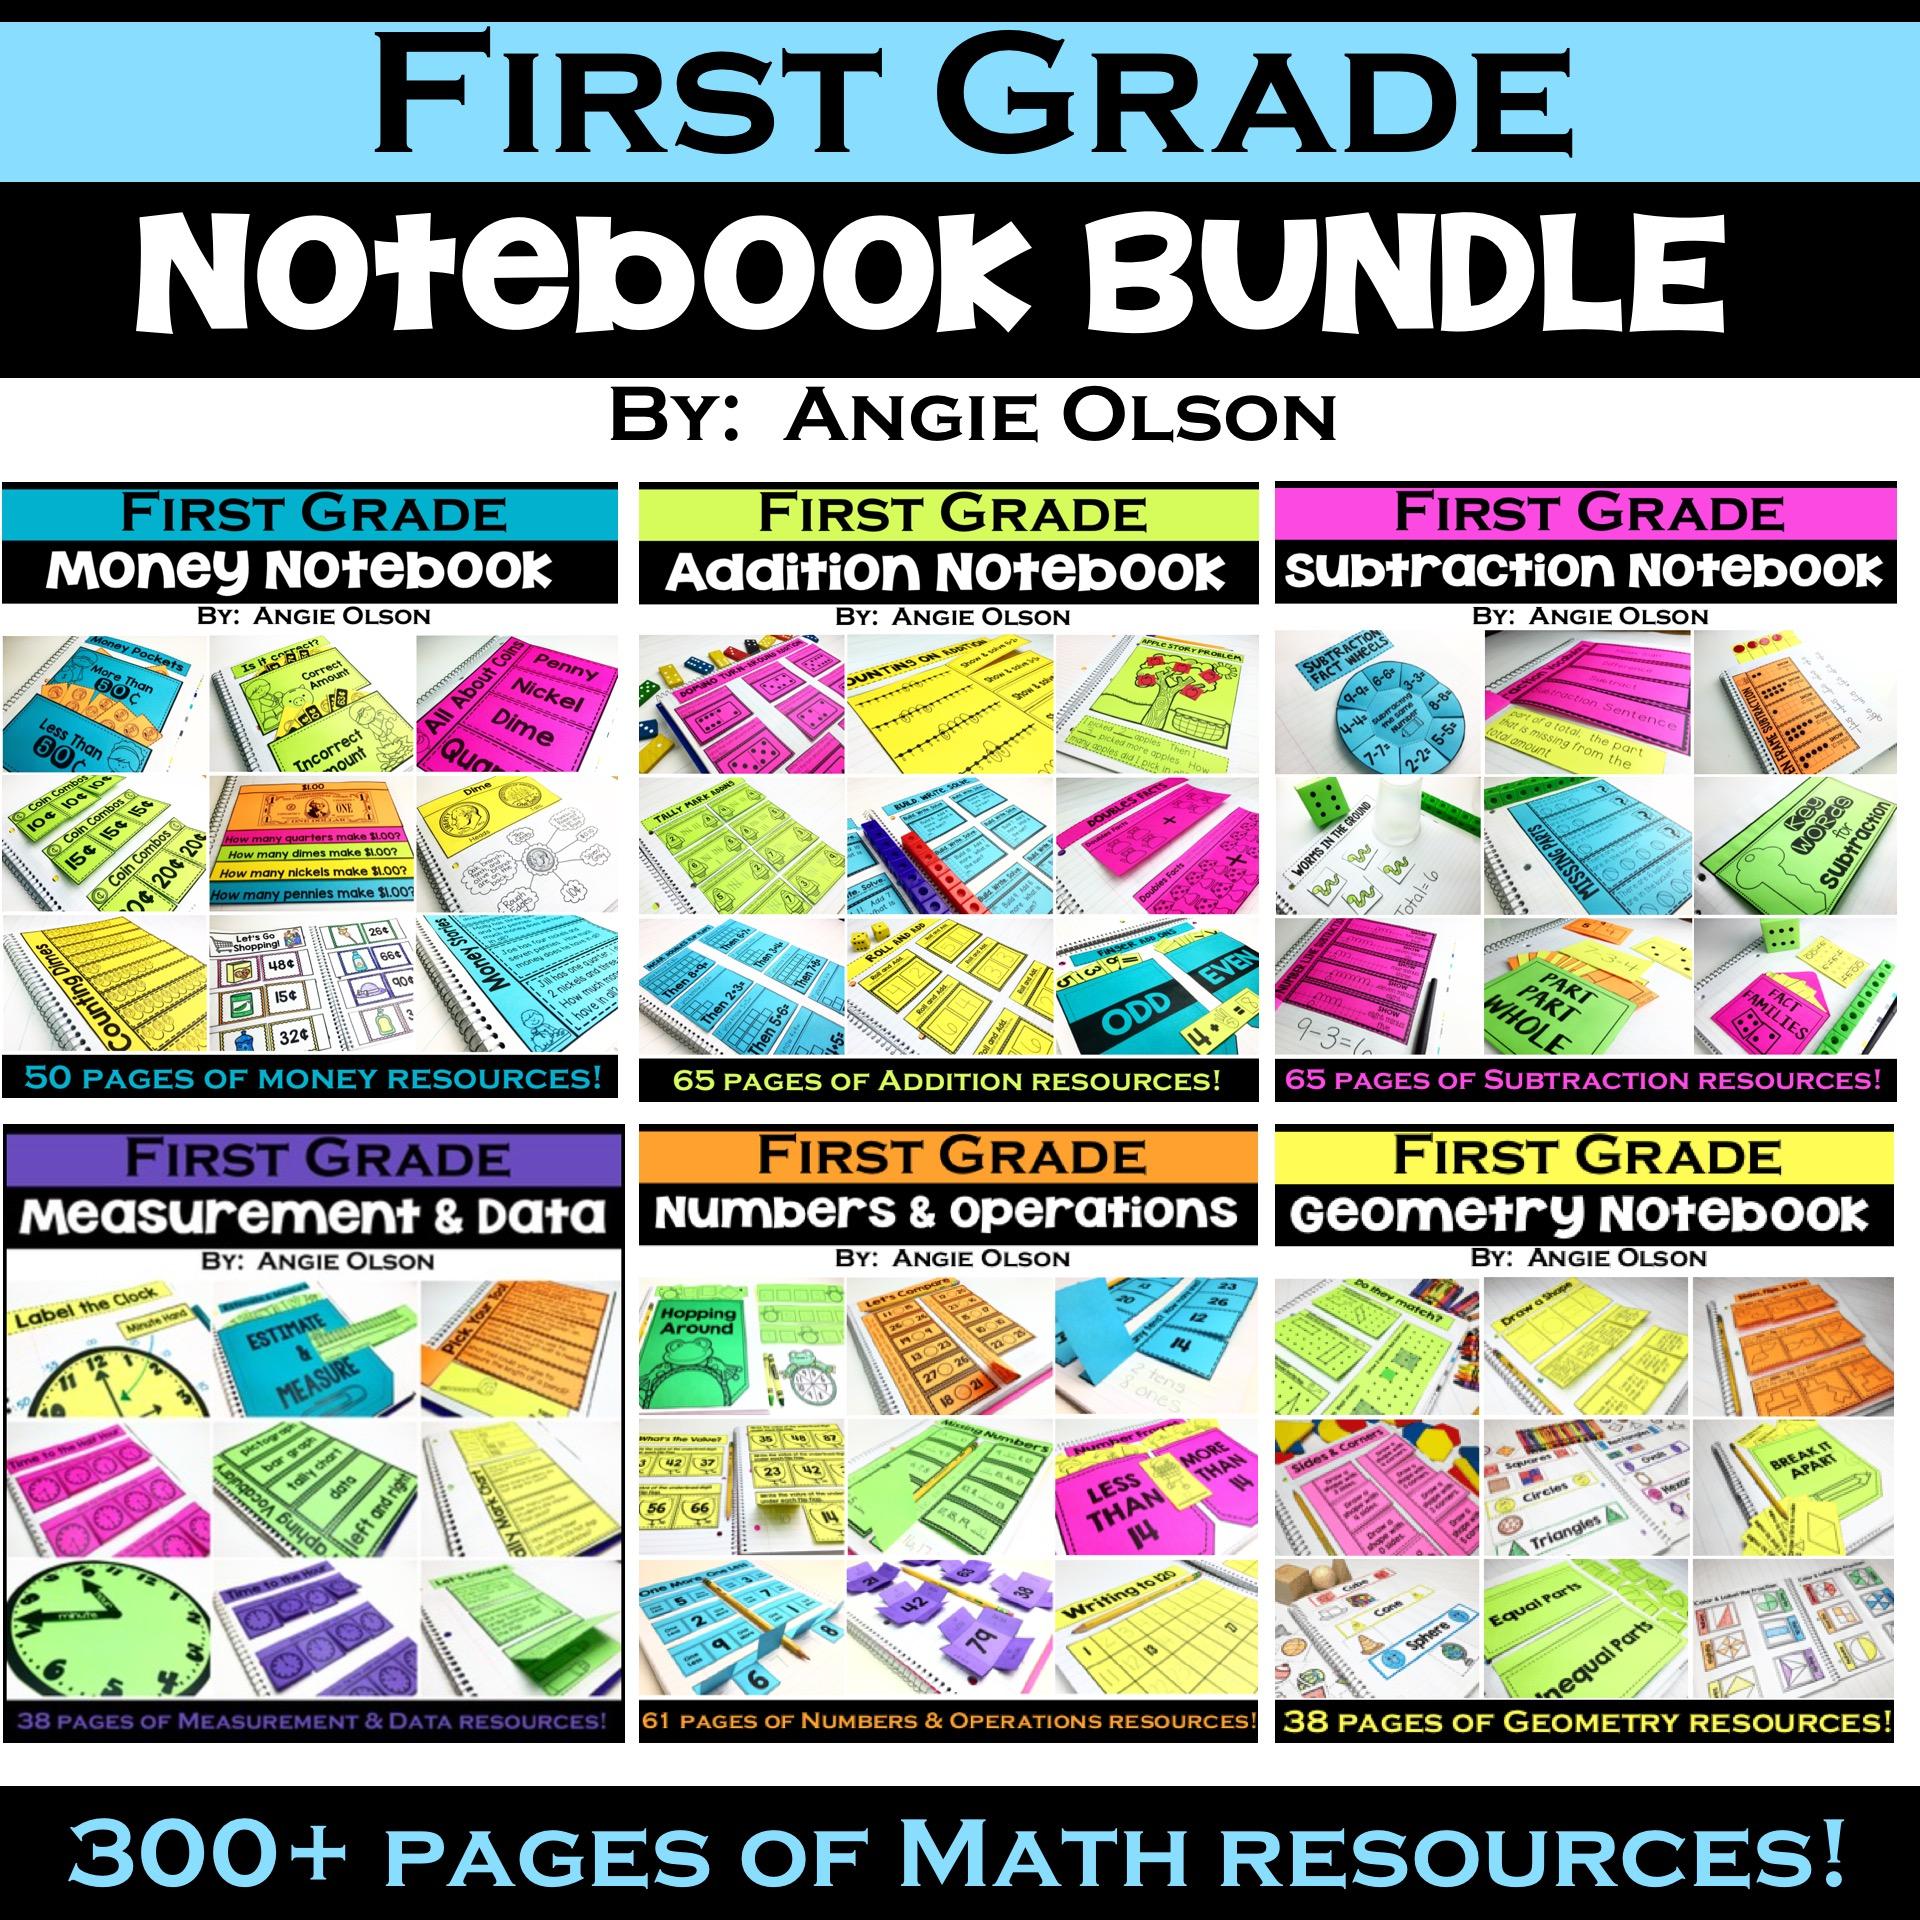 First Grade INB Bundle